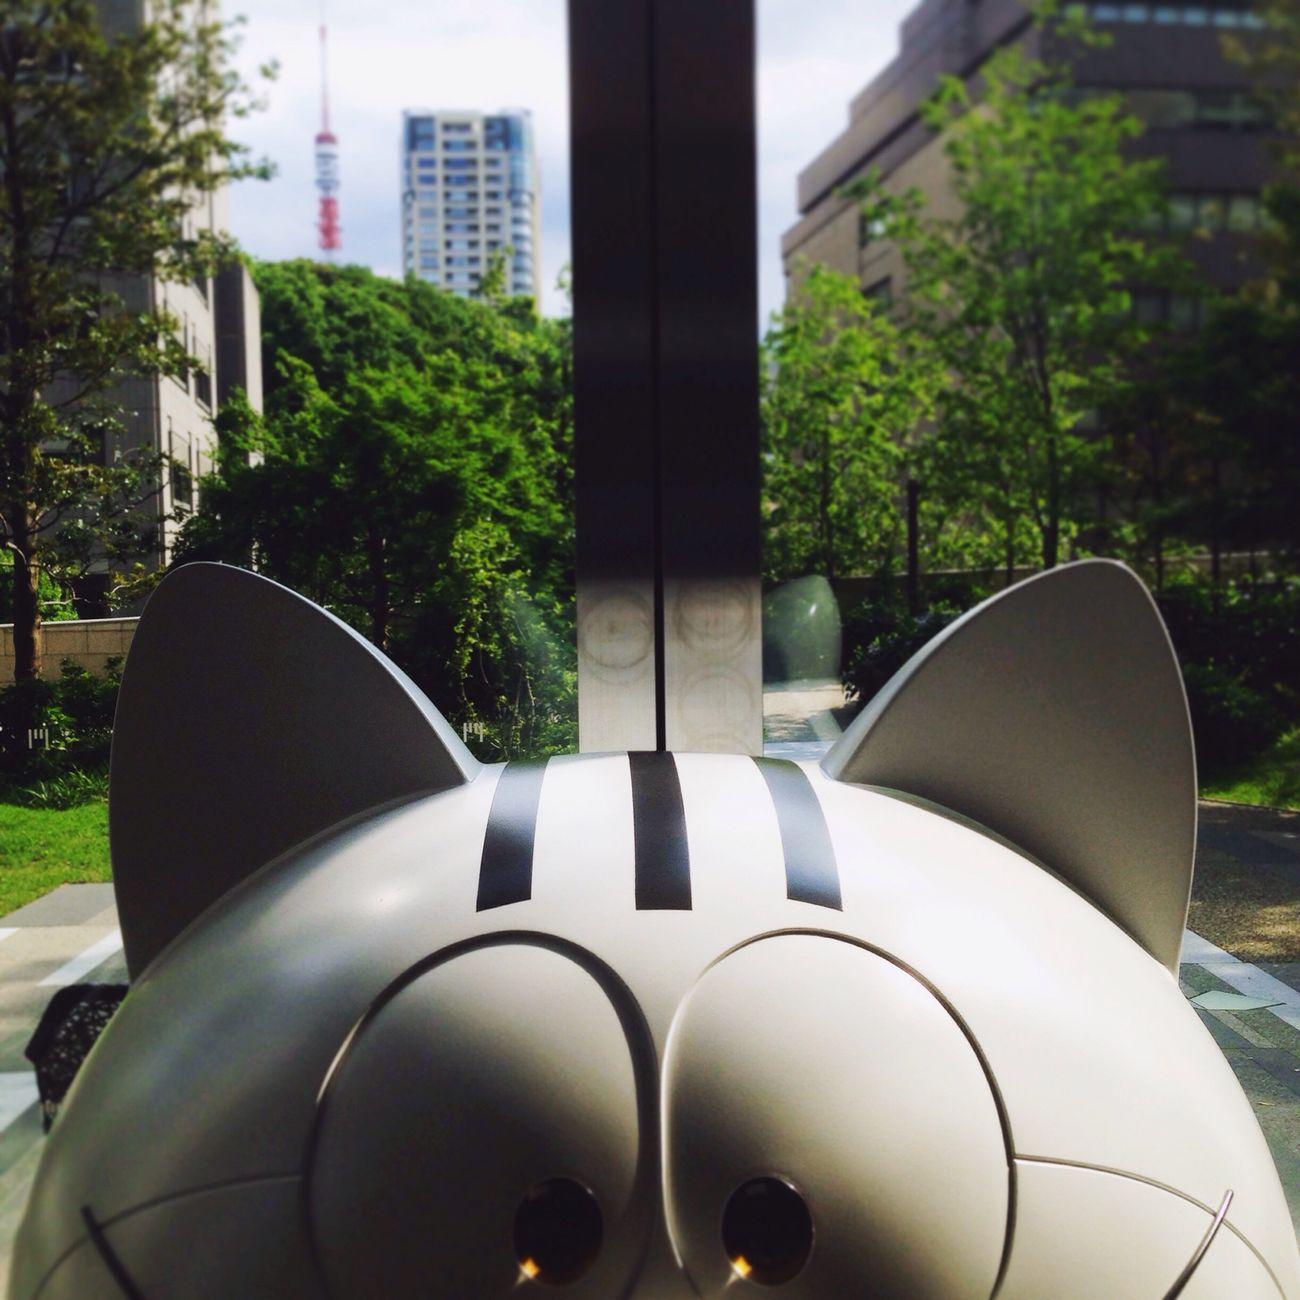 Toranomon Doraemon 3Stripes Sculptures Tokyotower